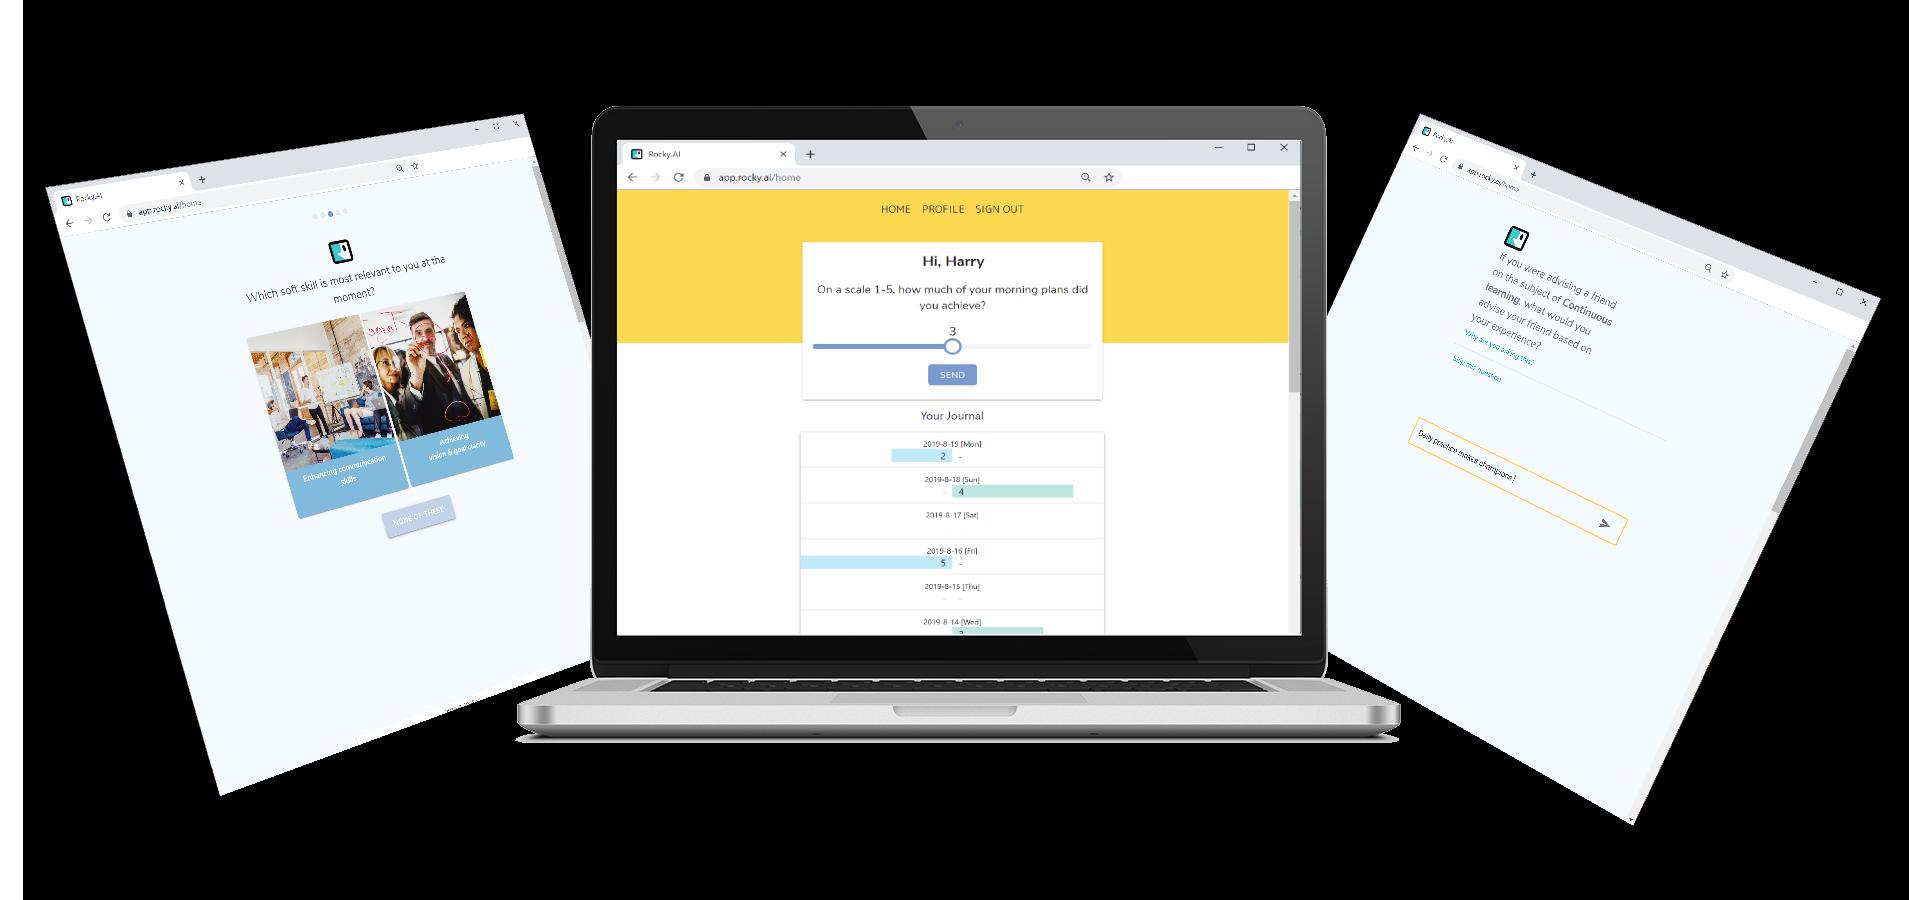 ROCKY.AI App - AI Chatbot, Coach, Assistant, Leadership